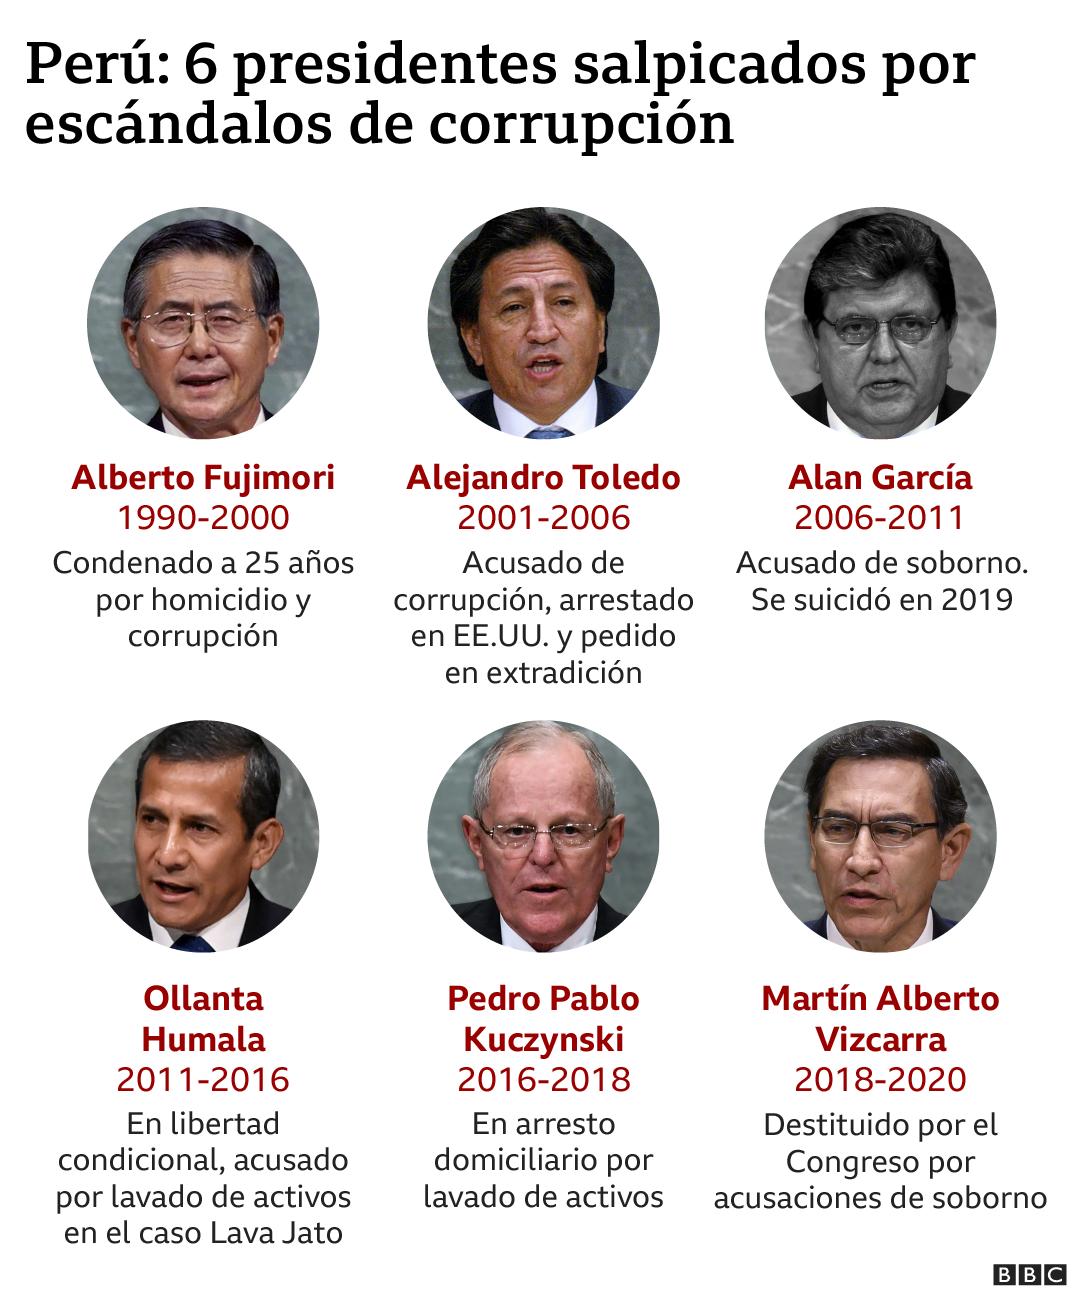 Presidentes de Perú